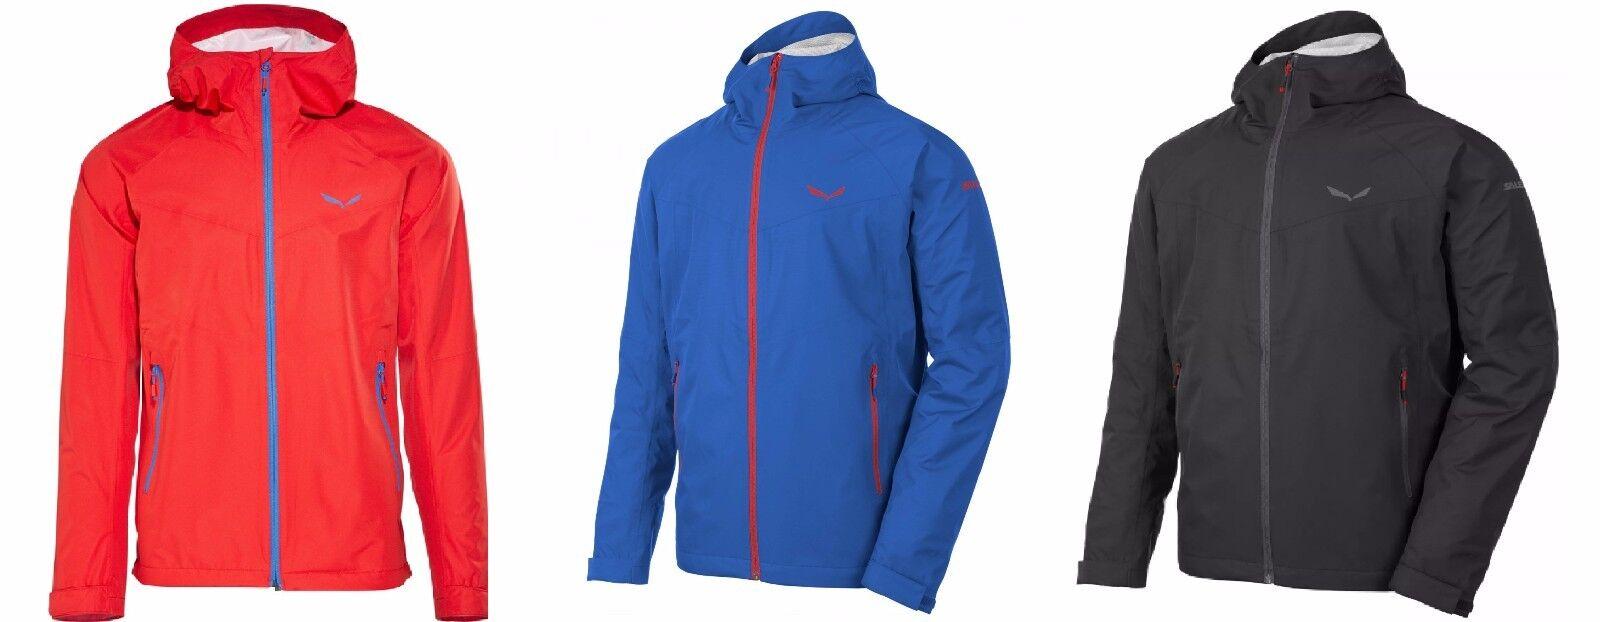 Salewa puez (Aqua 3) power-Tex chaqueta señores senderismo impermeable fácilmente